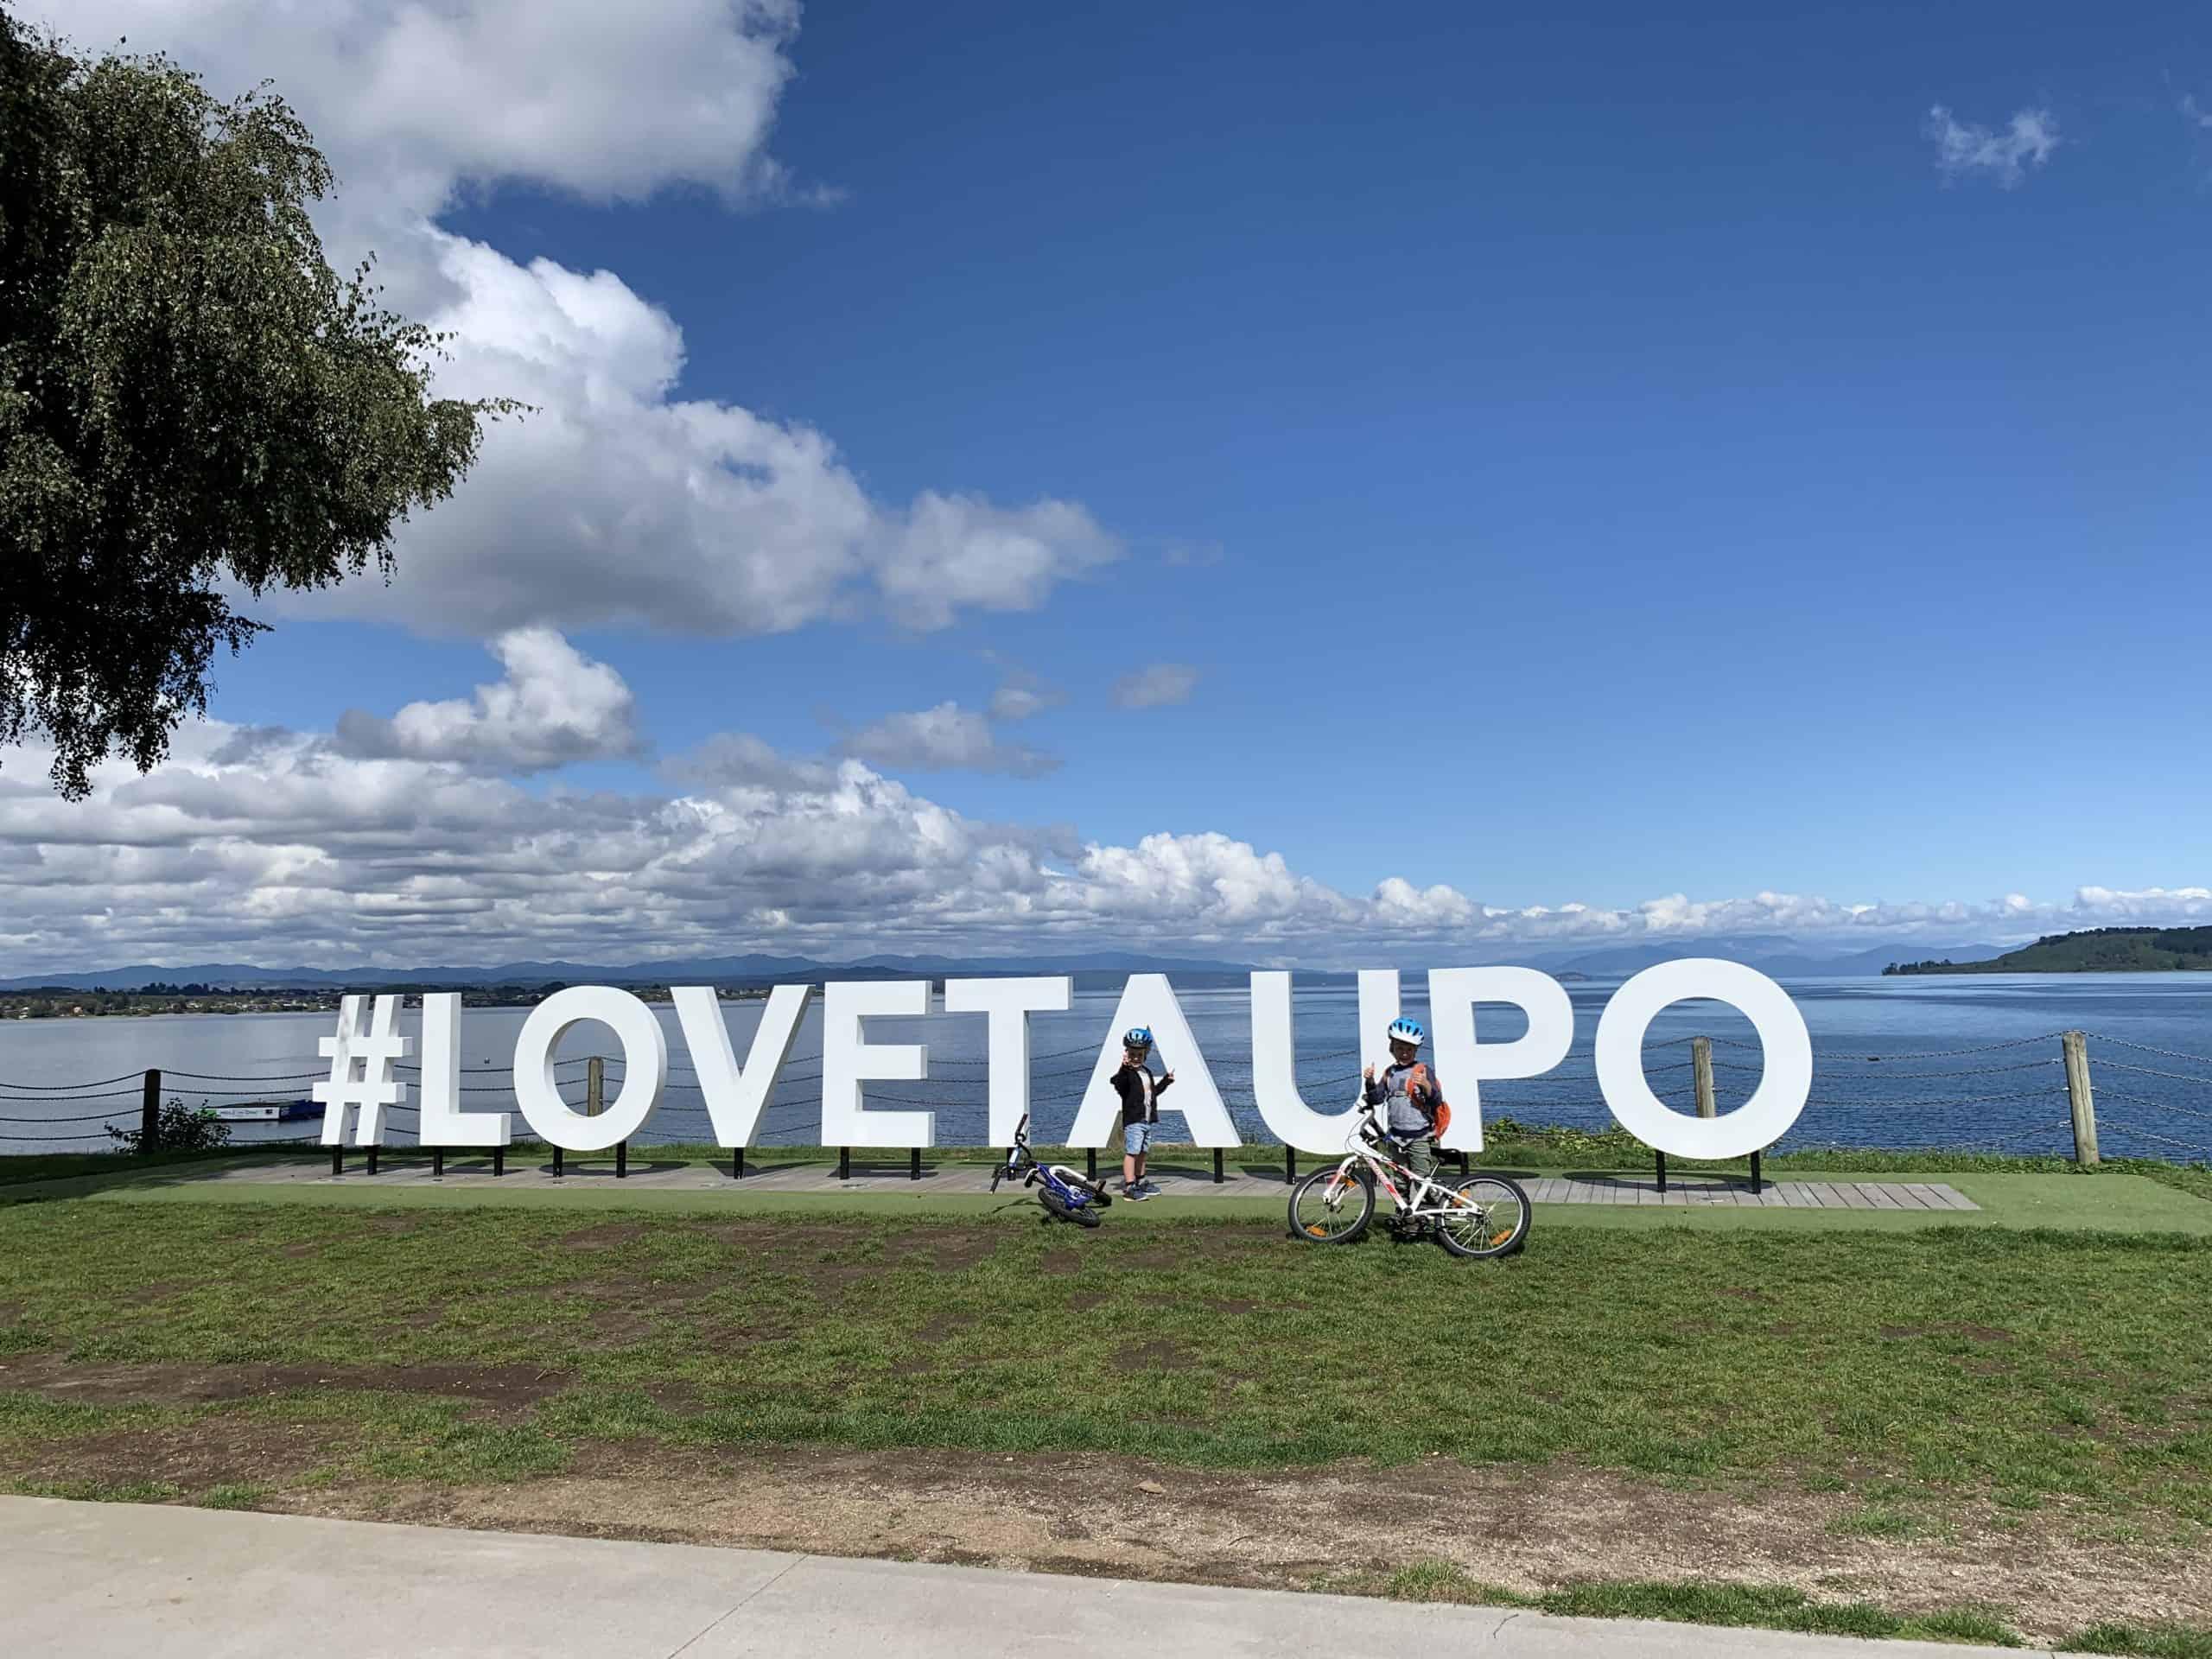 Love Taupo sign